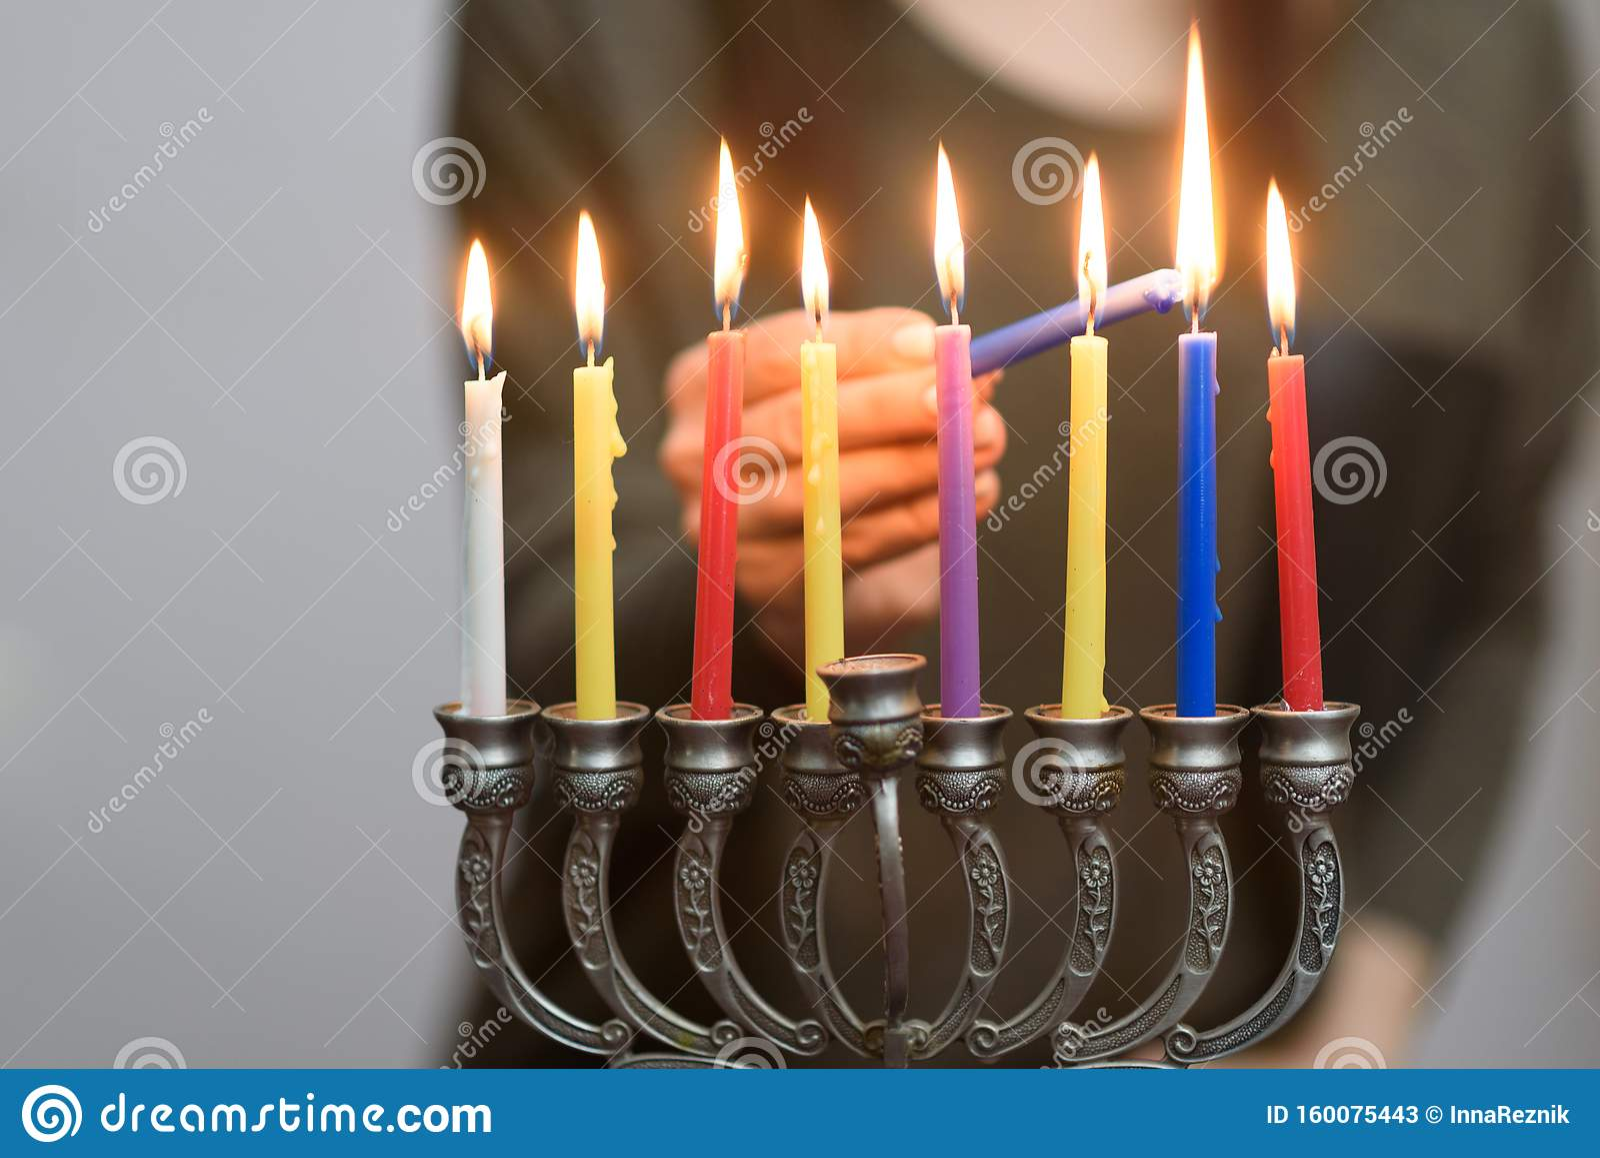 Jewish Woman lighting Hanukkah Candles in a menorah.